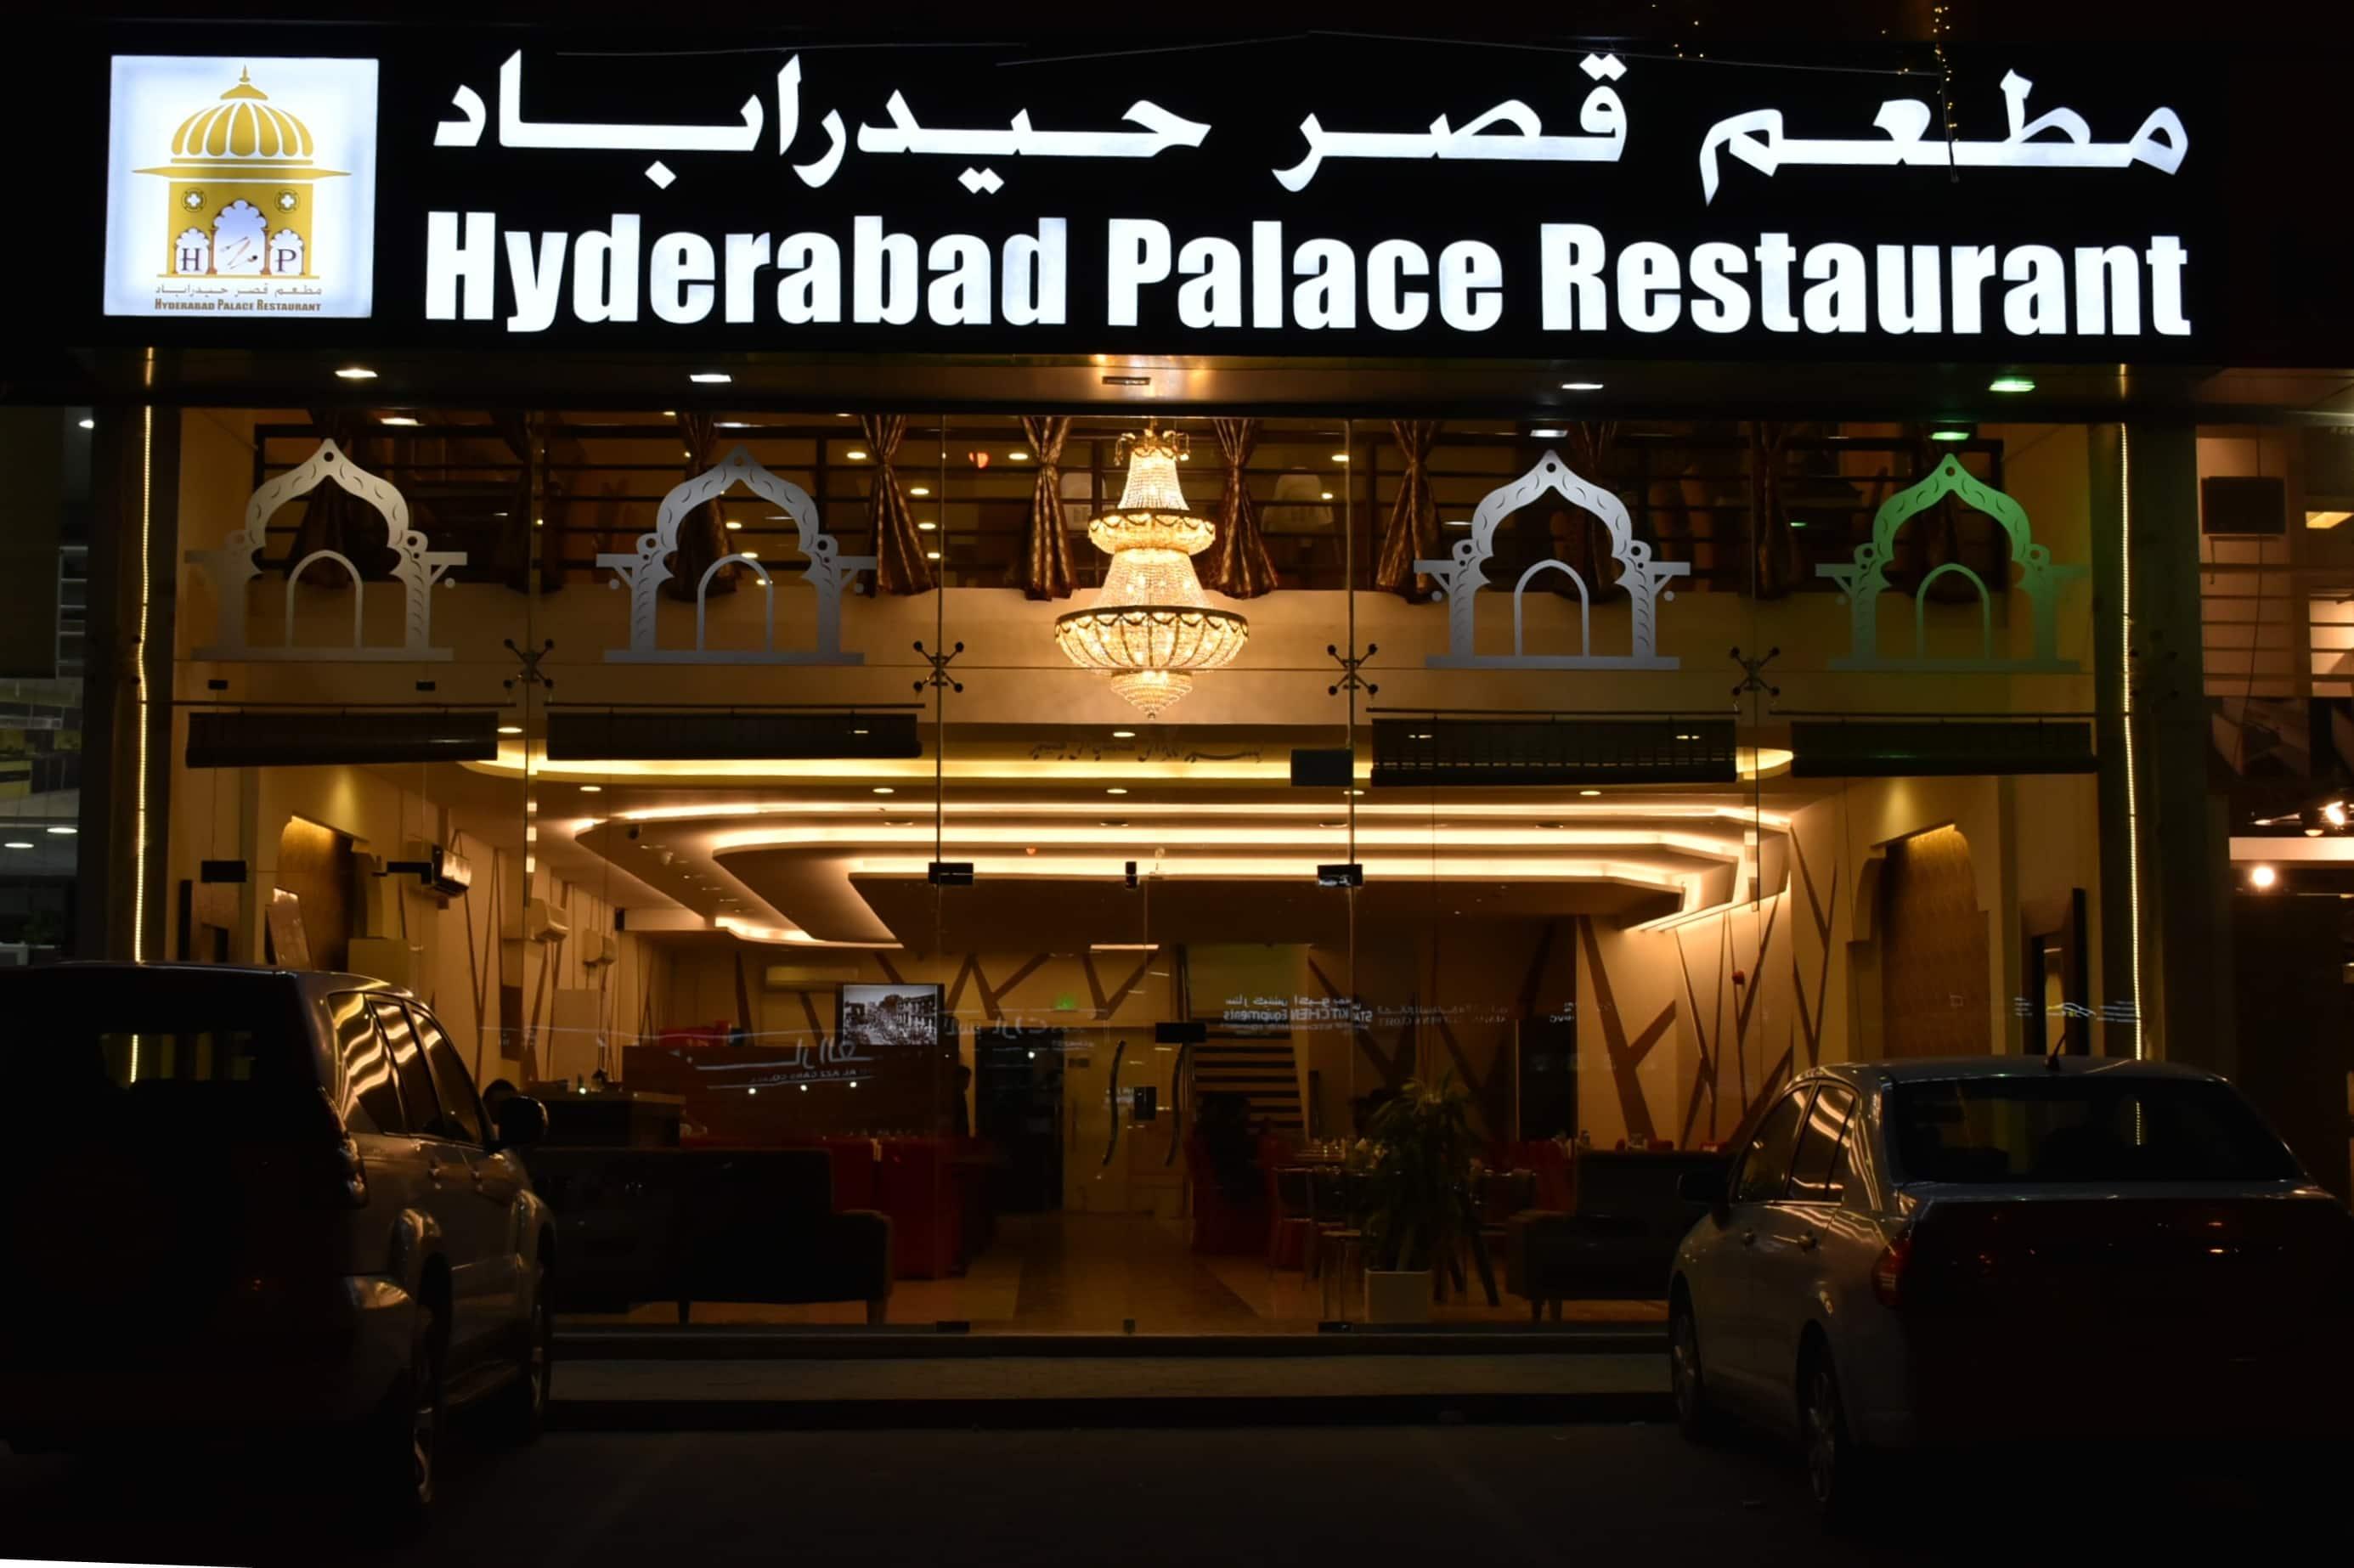 Hyderabad Palace Restaurant, Al Aziziyah, Doha